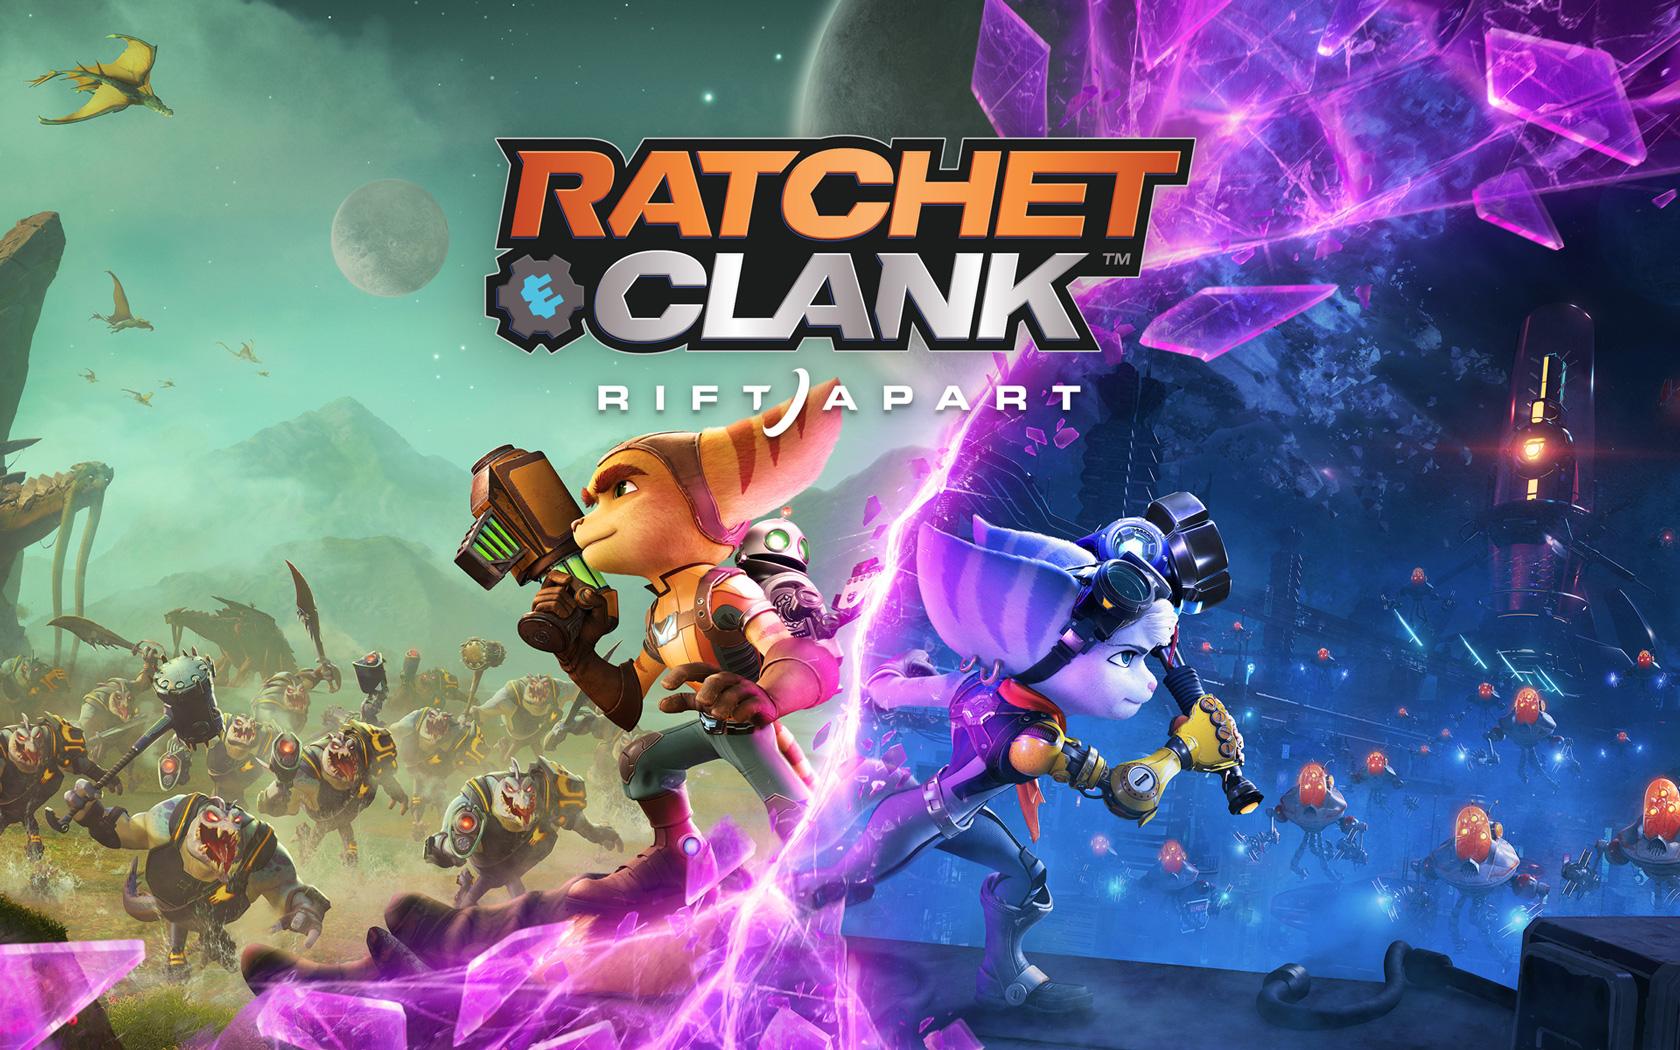 Free Ratchet & Clank: Rift Apart Wallpaper in 1680x1050